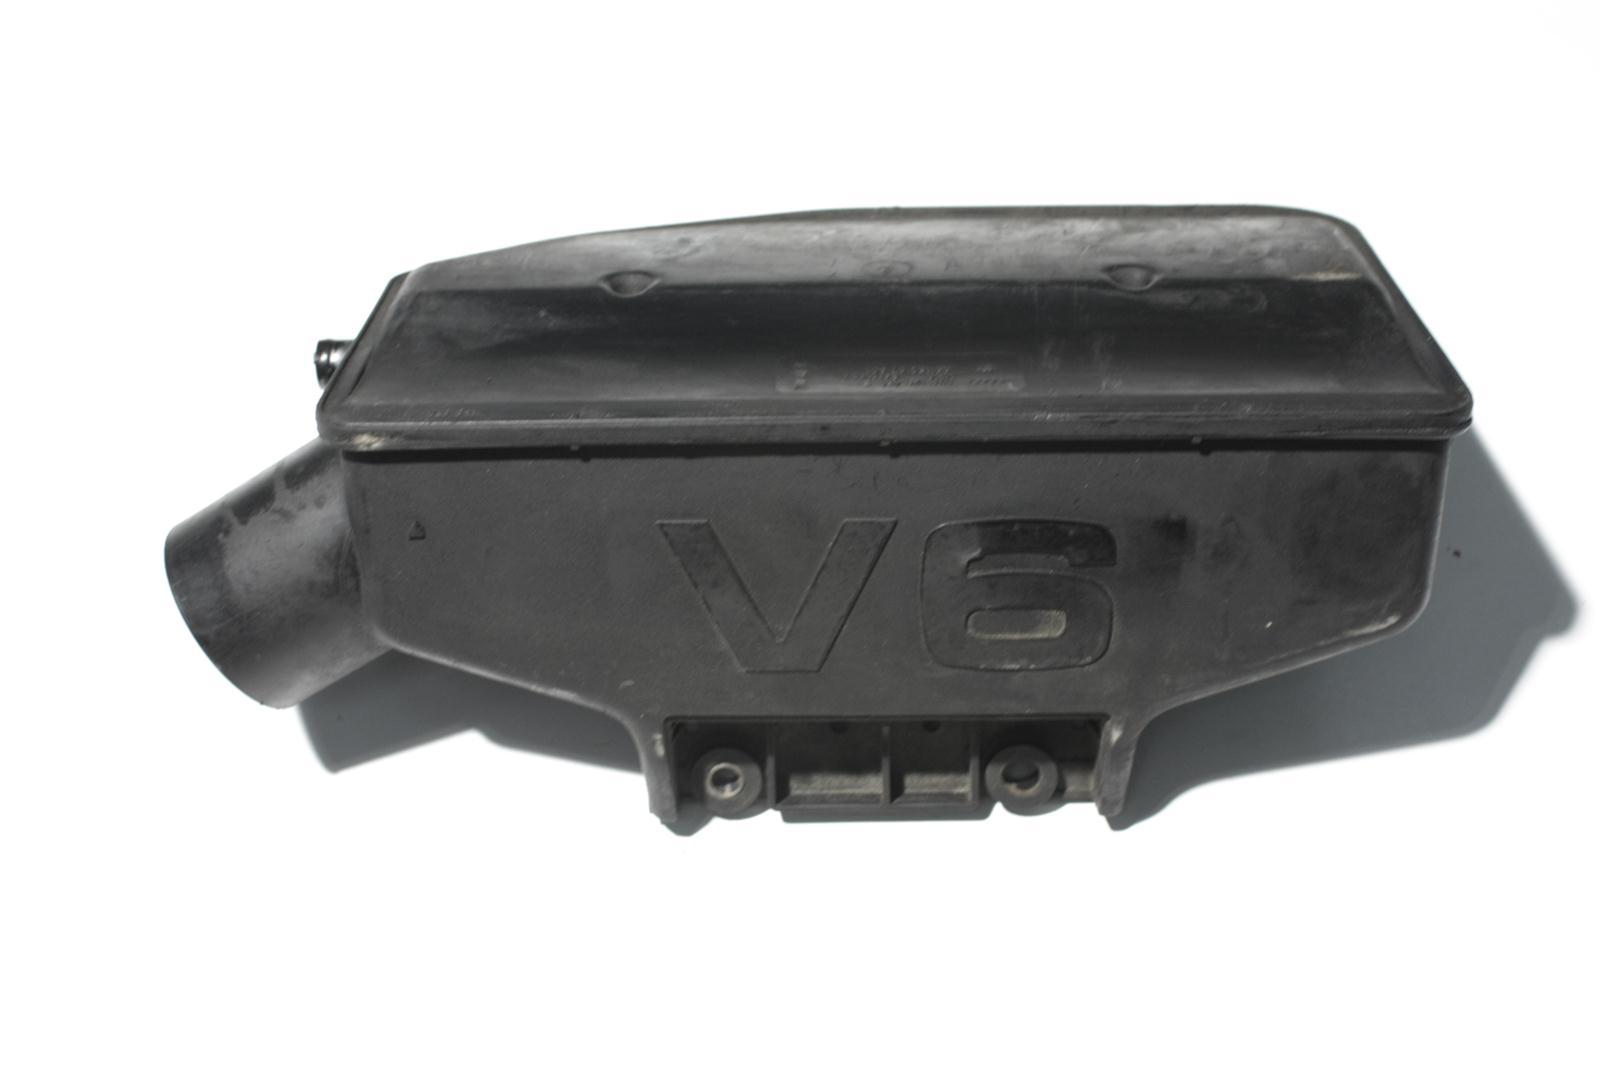 Audi 100/A6 C4 2.6/2.8l Geräuschdämpfer 078129951E 078129951H